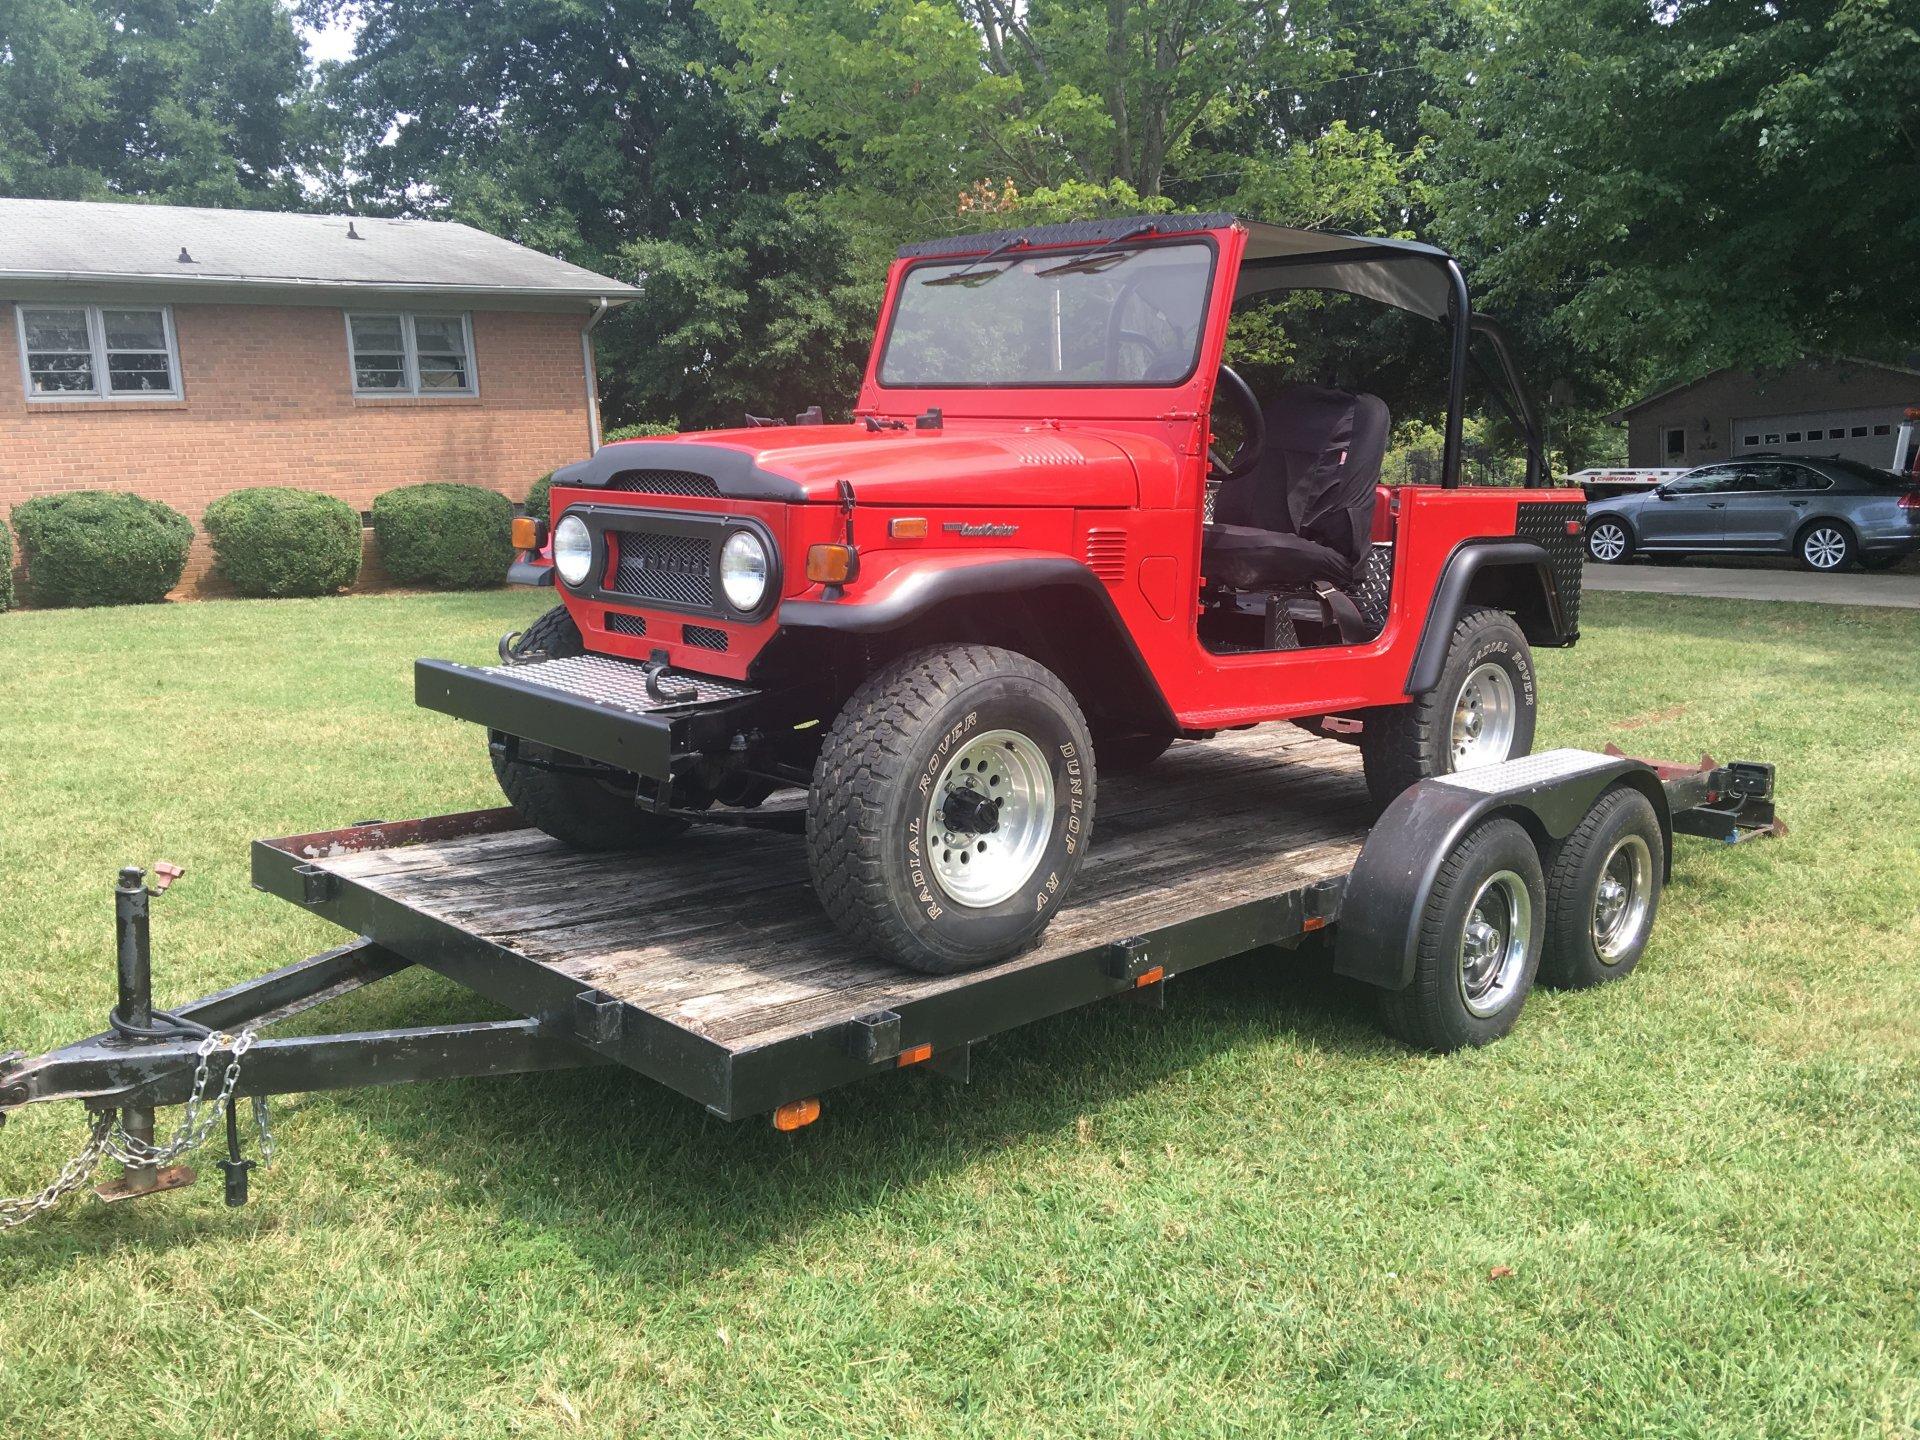 For Sale - 16\' Car Trailer Mooresville NC $1,500 | IH8MUD Forum